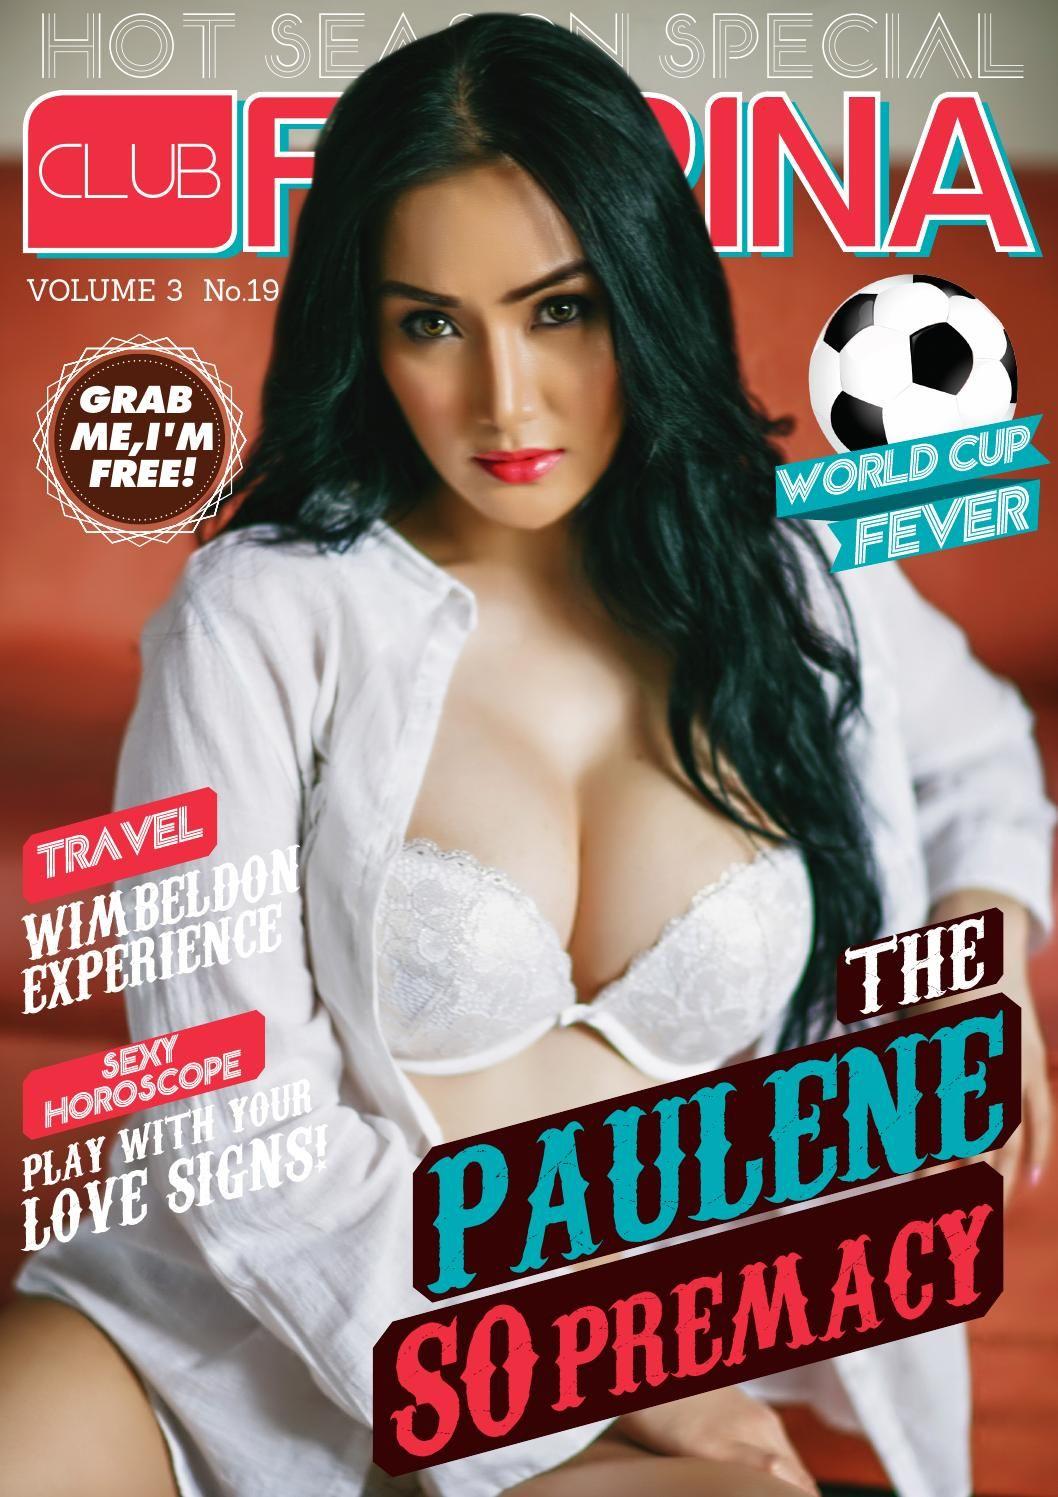 Clube sexy magazine